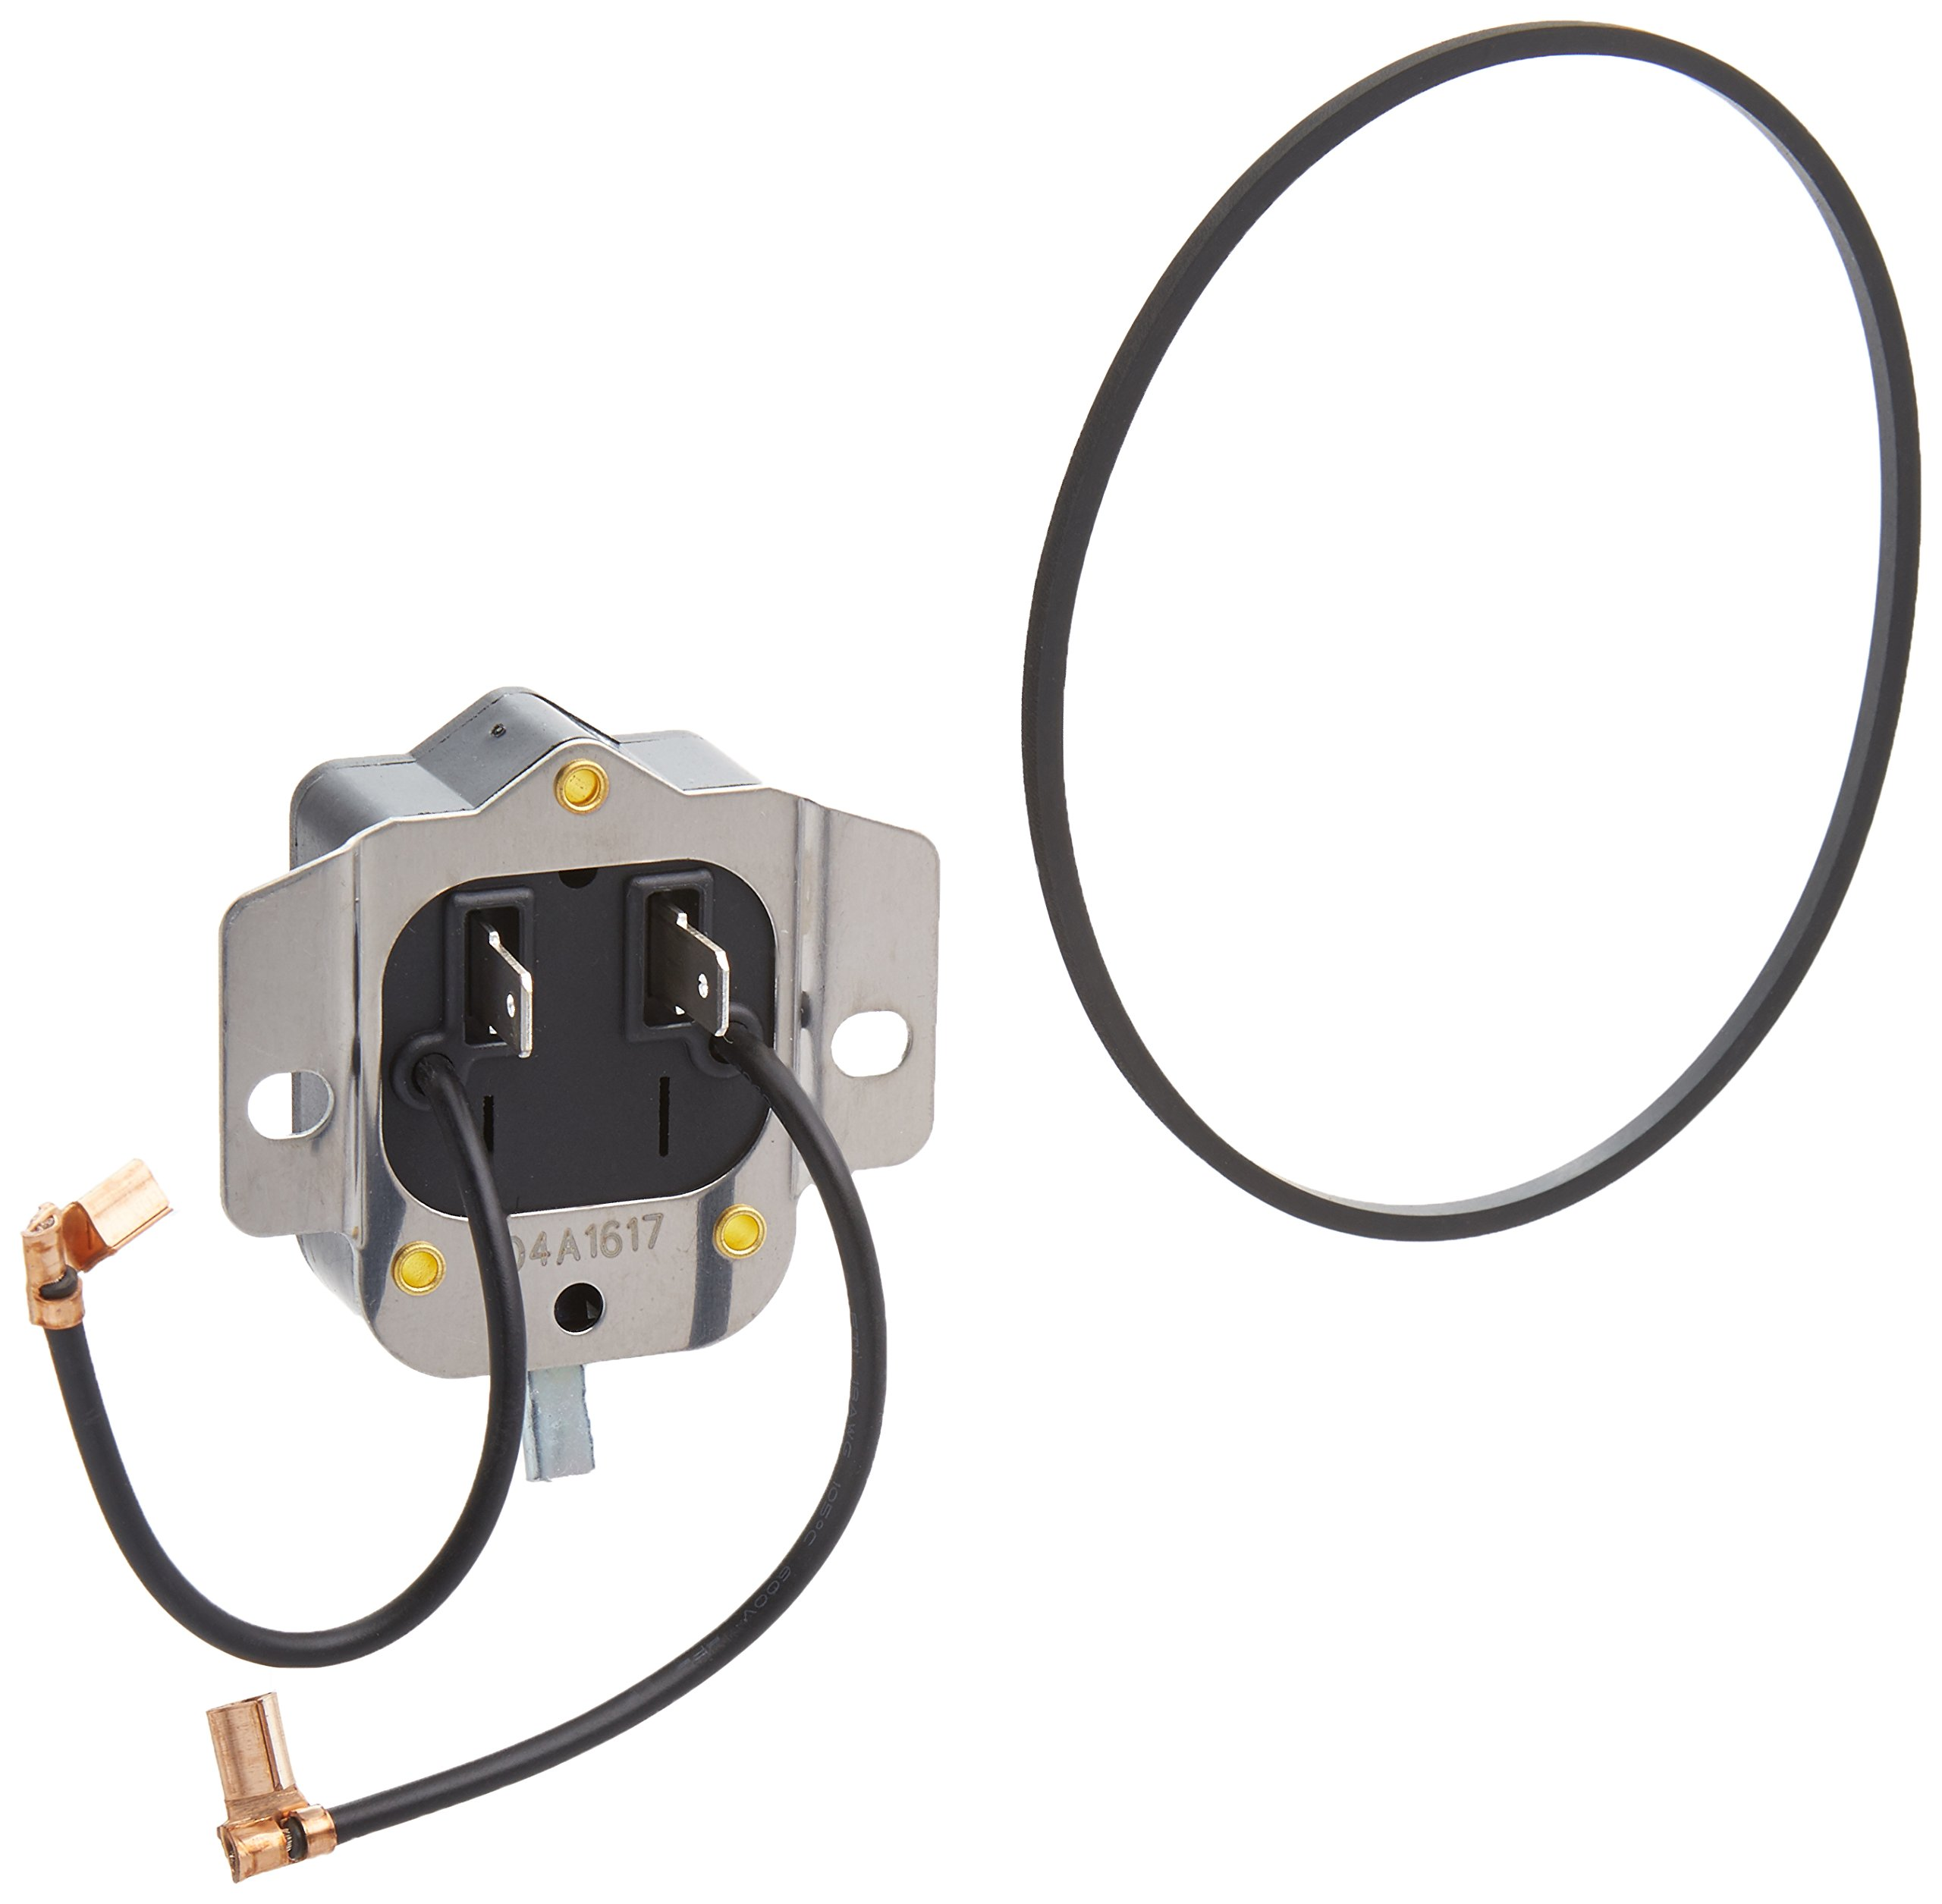 Wayne 56395 Switch Repair Kit for CDU, SPF & SSPF by Wayne